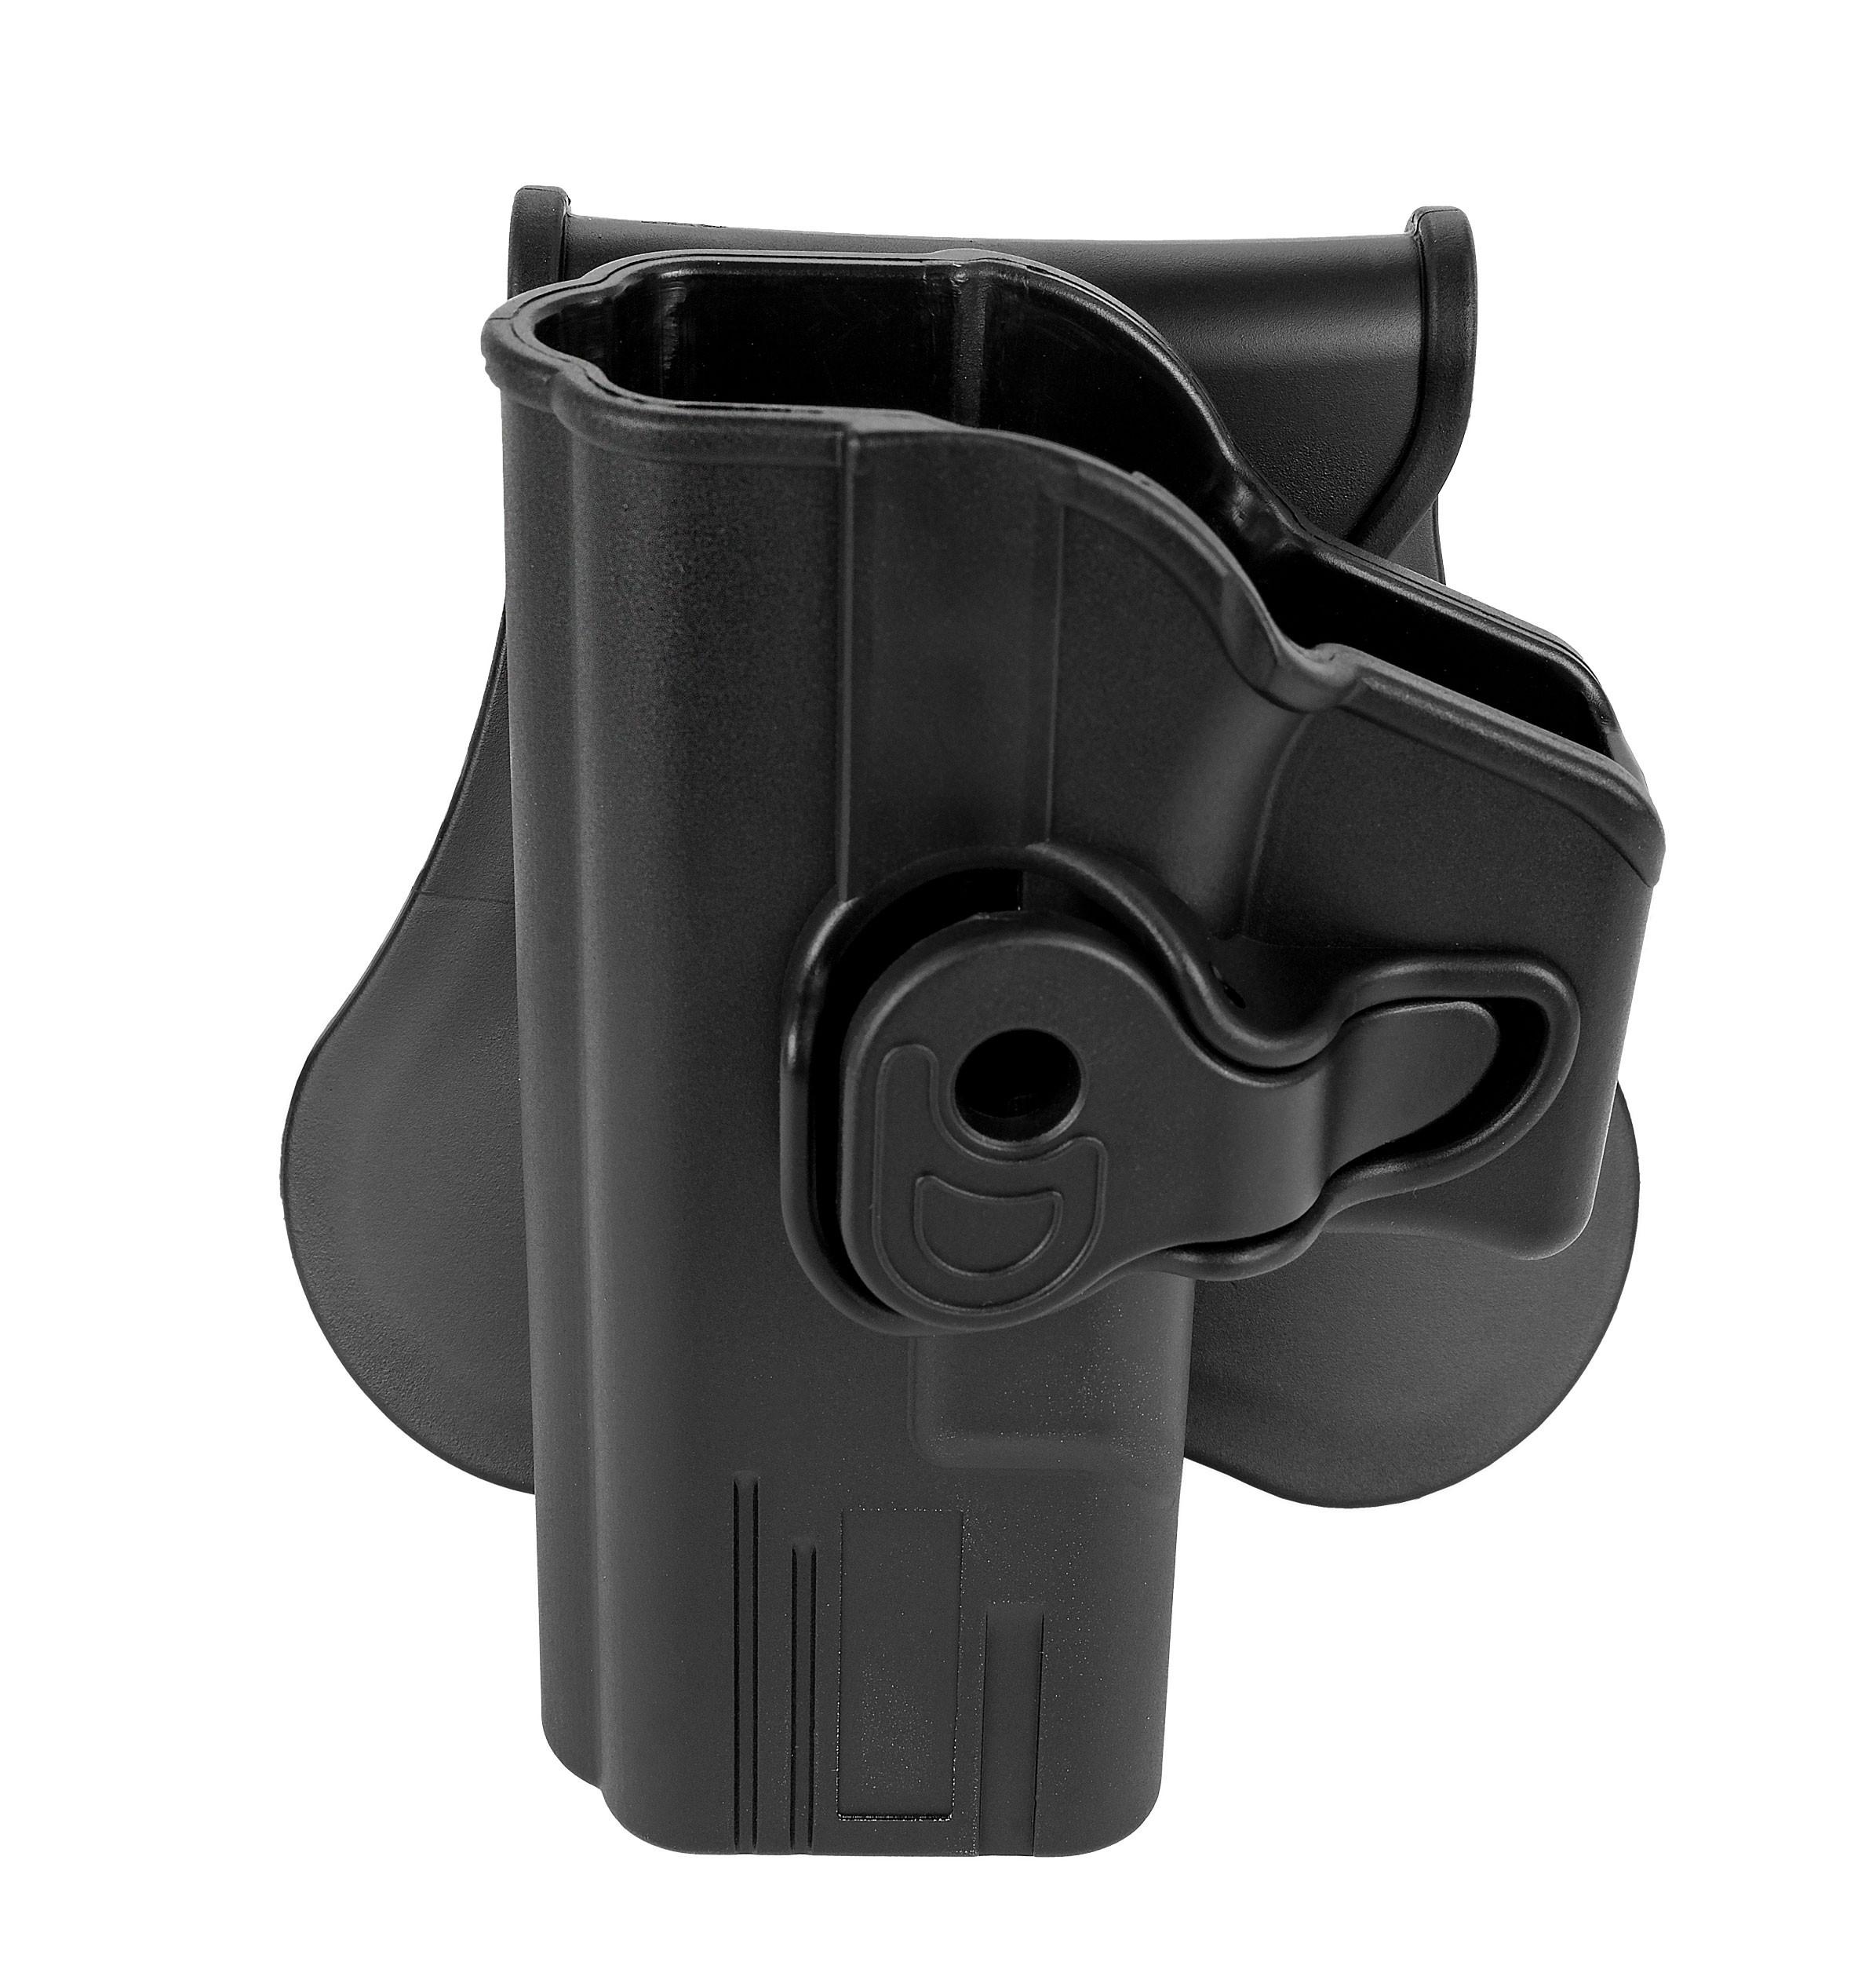 Fits Glock 19, 23, 32 (Gen 1,2,3,4) Left Hand Holster